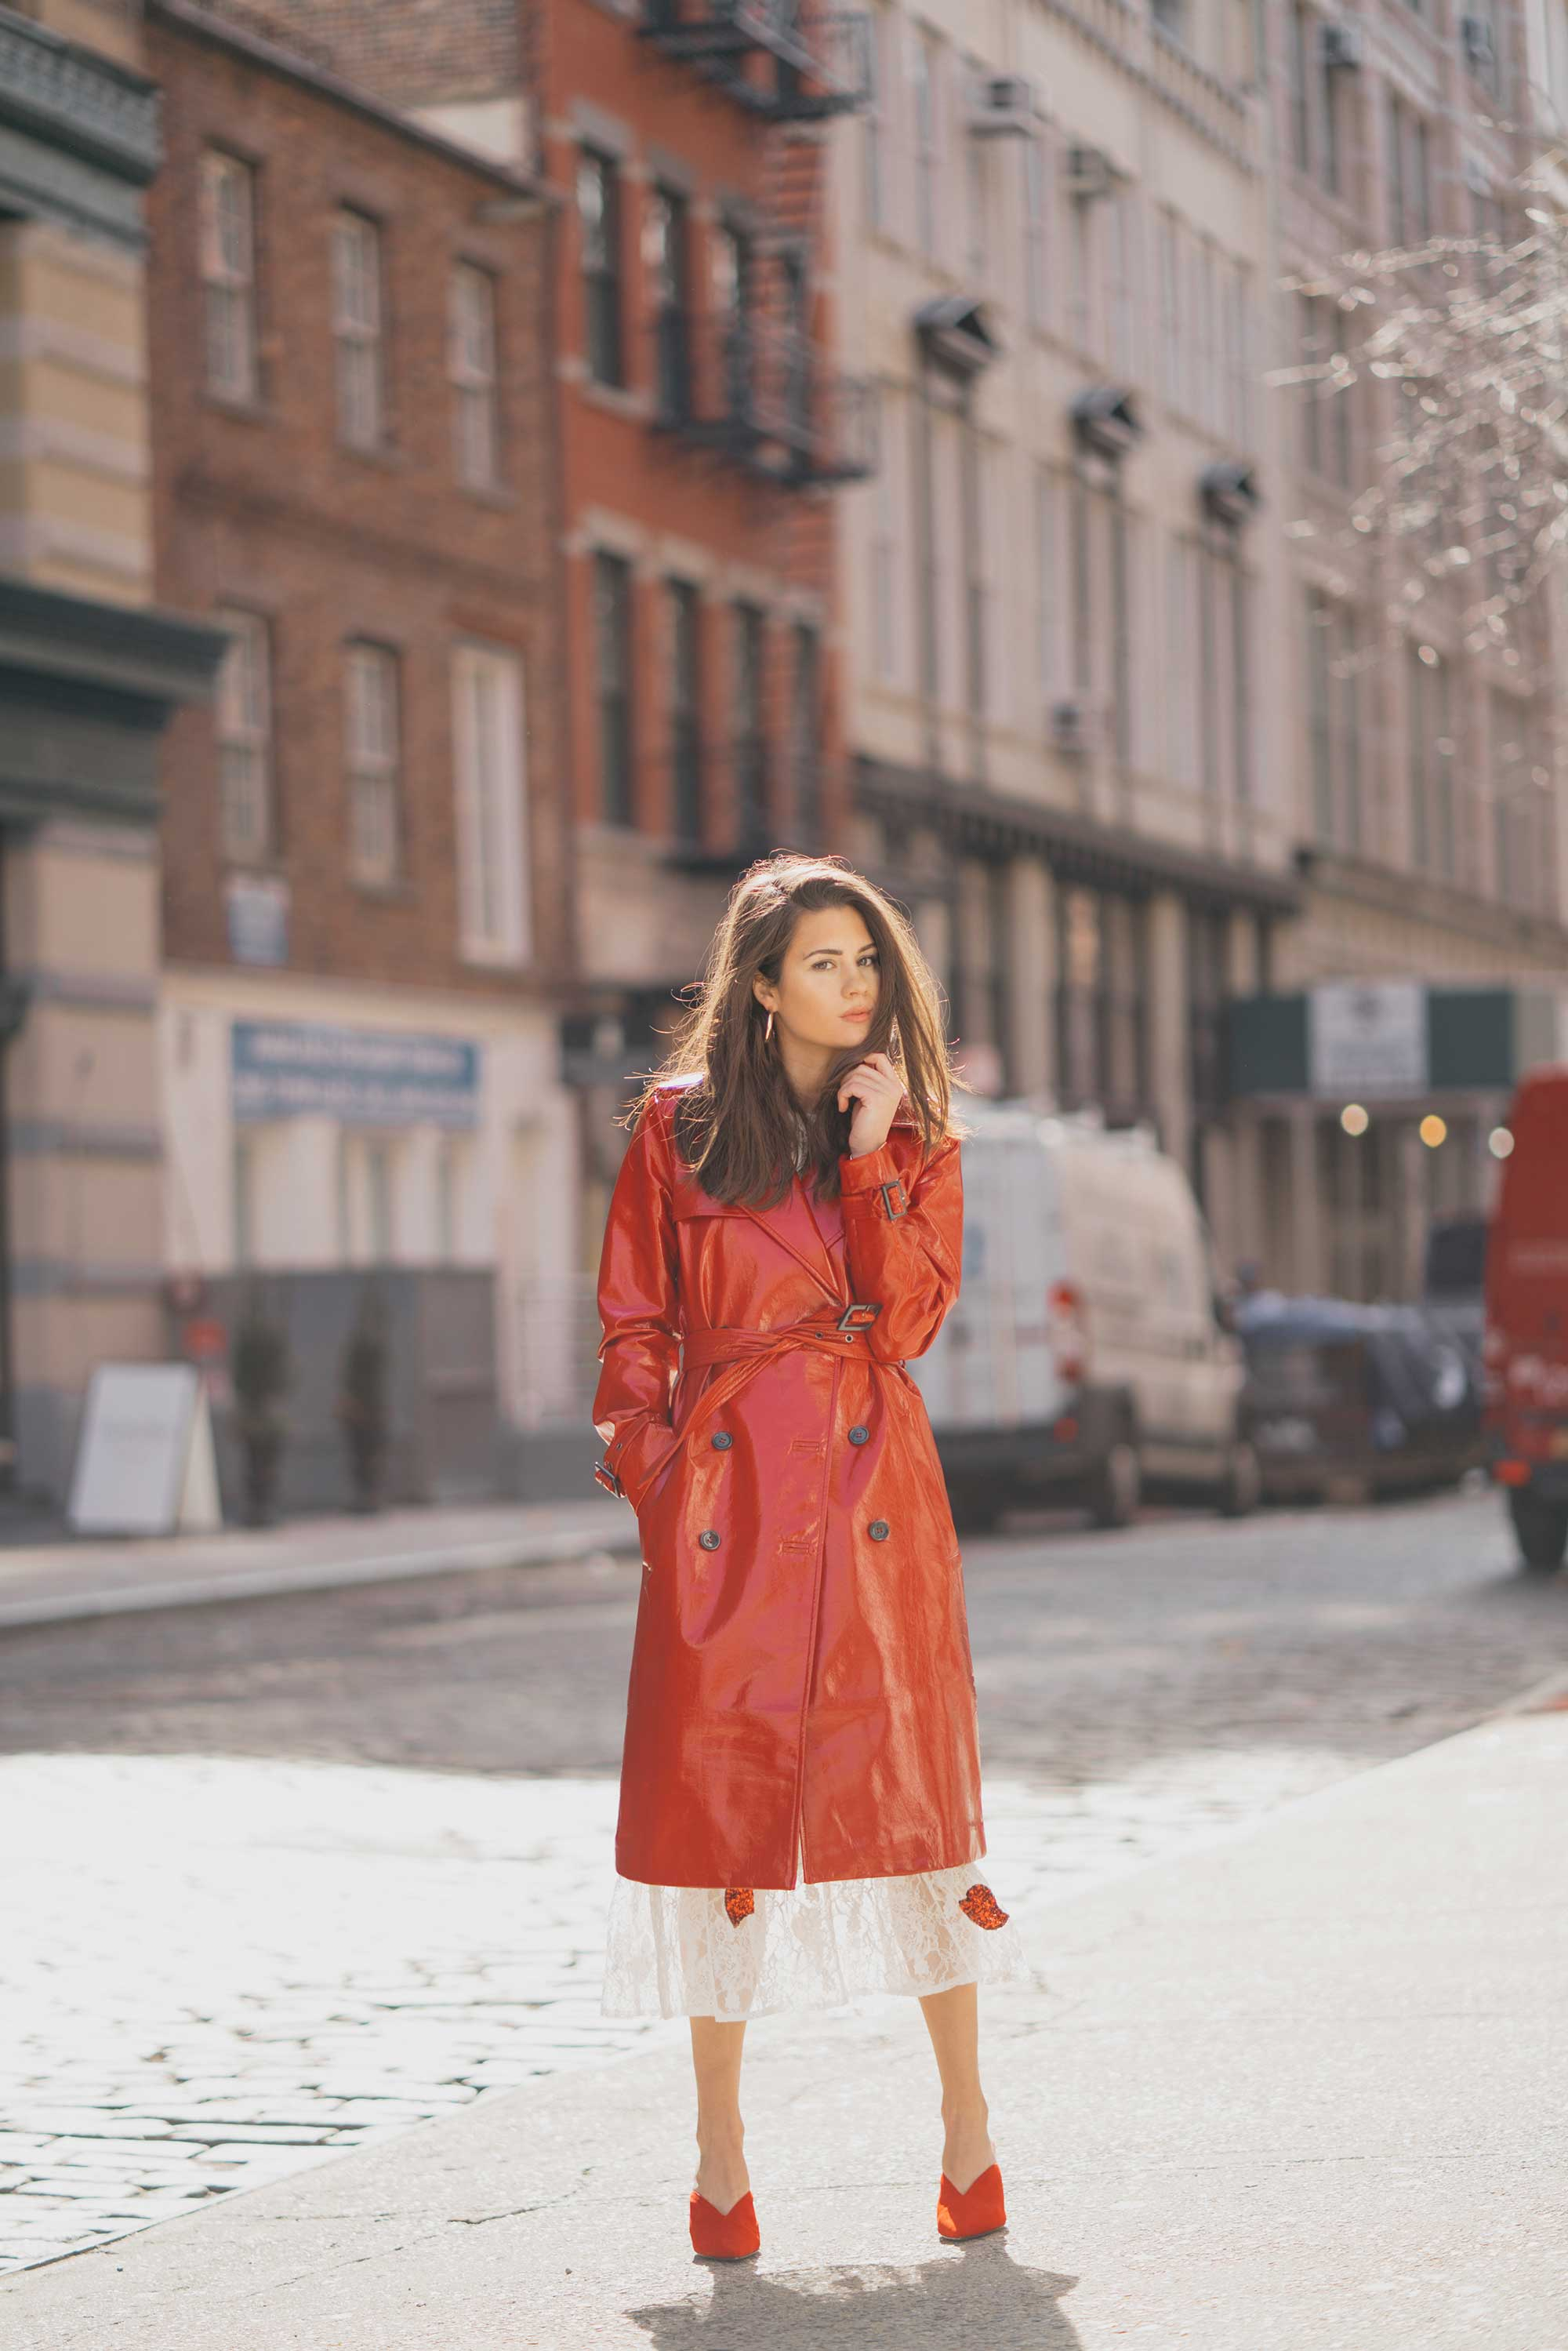 For-Love-and-Lemons-La-Zosia-Midi-Dress-Sheer-lace-sequin-heart-applique3.jpg